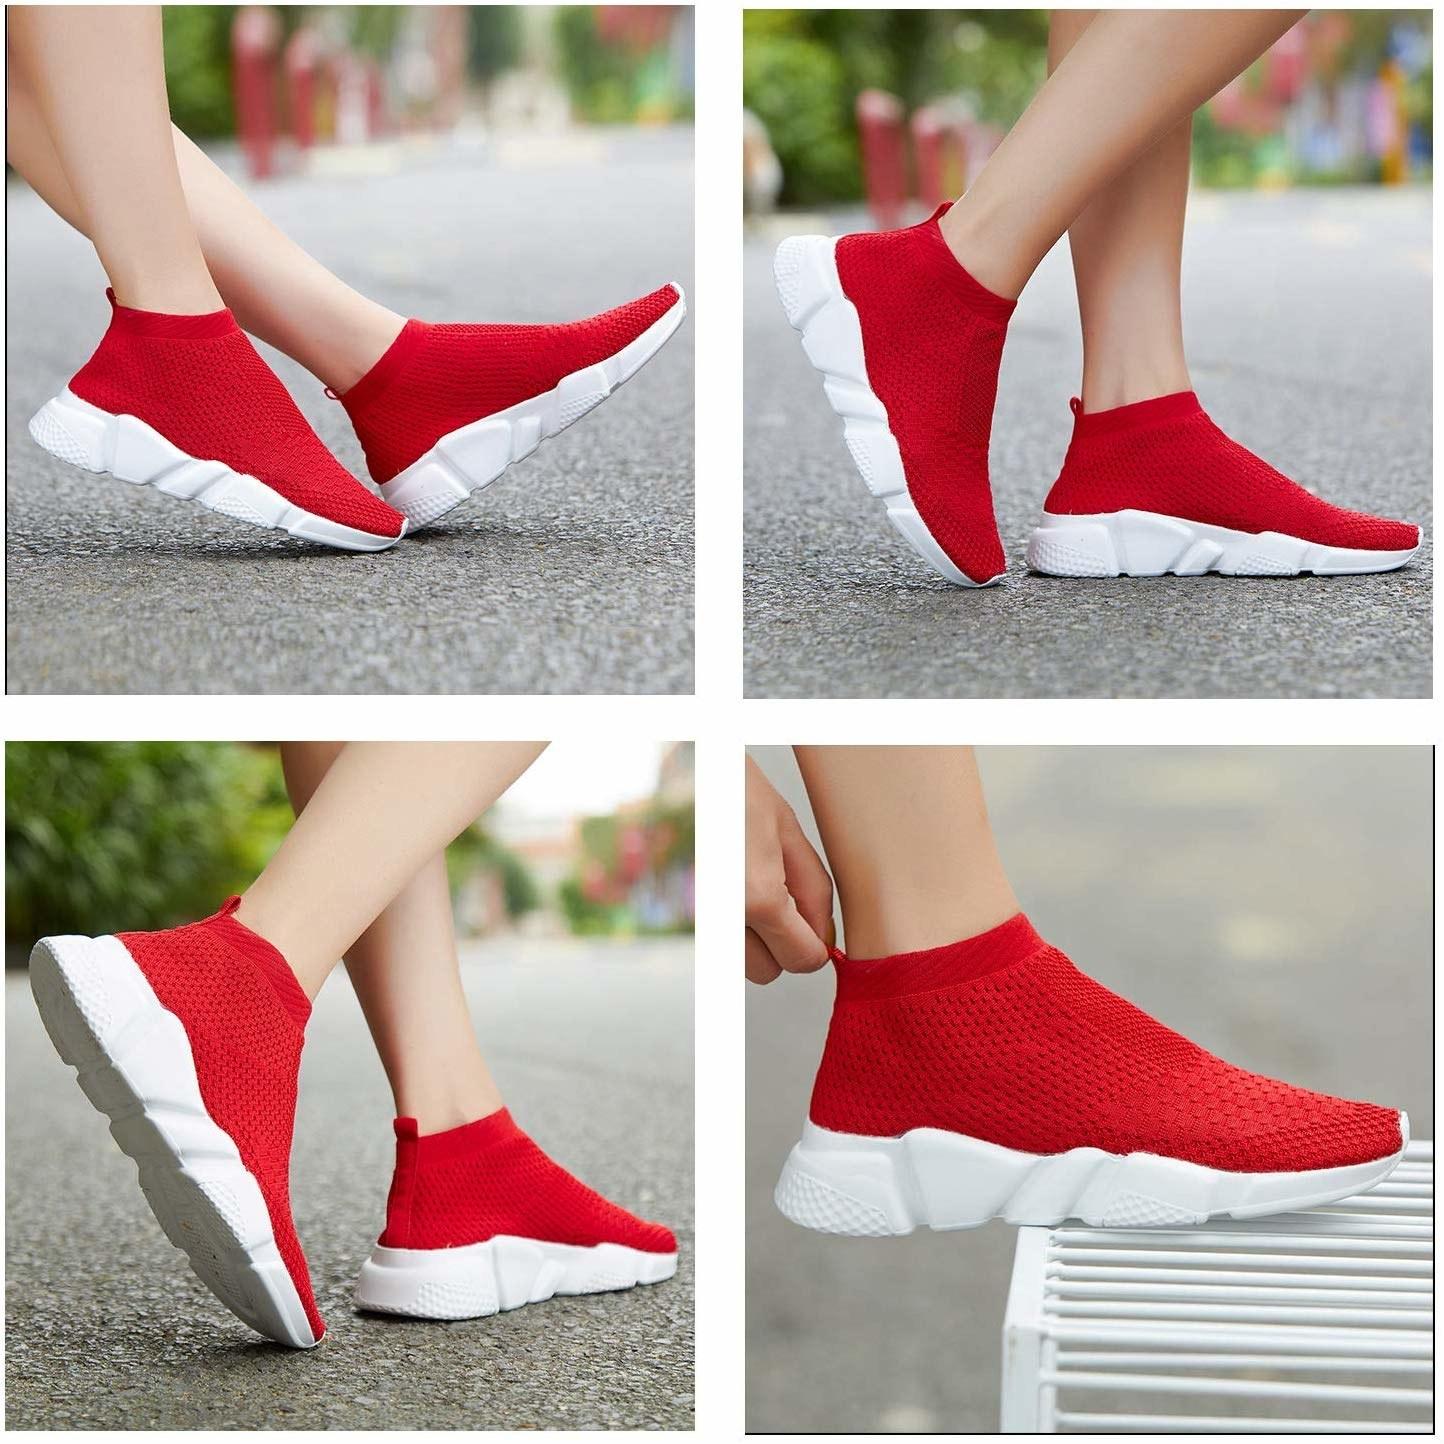 Model wearing the slip-on mesh sneakers in red